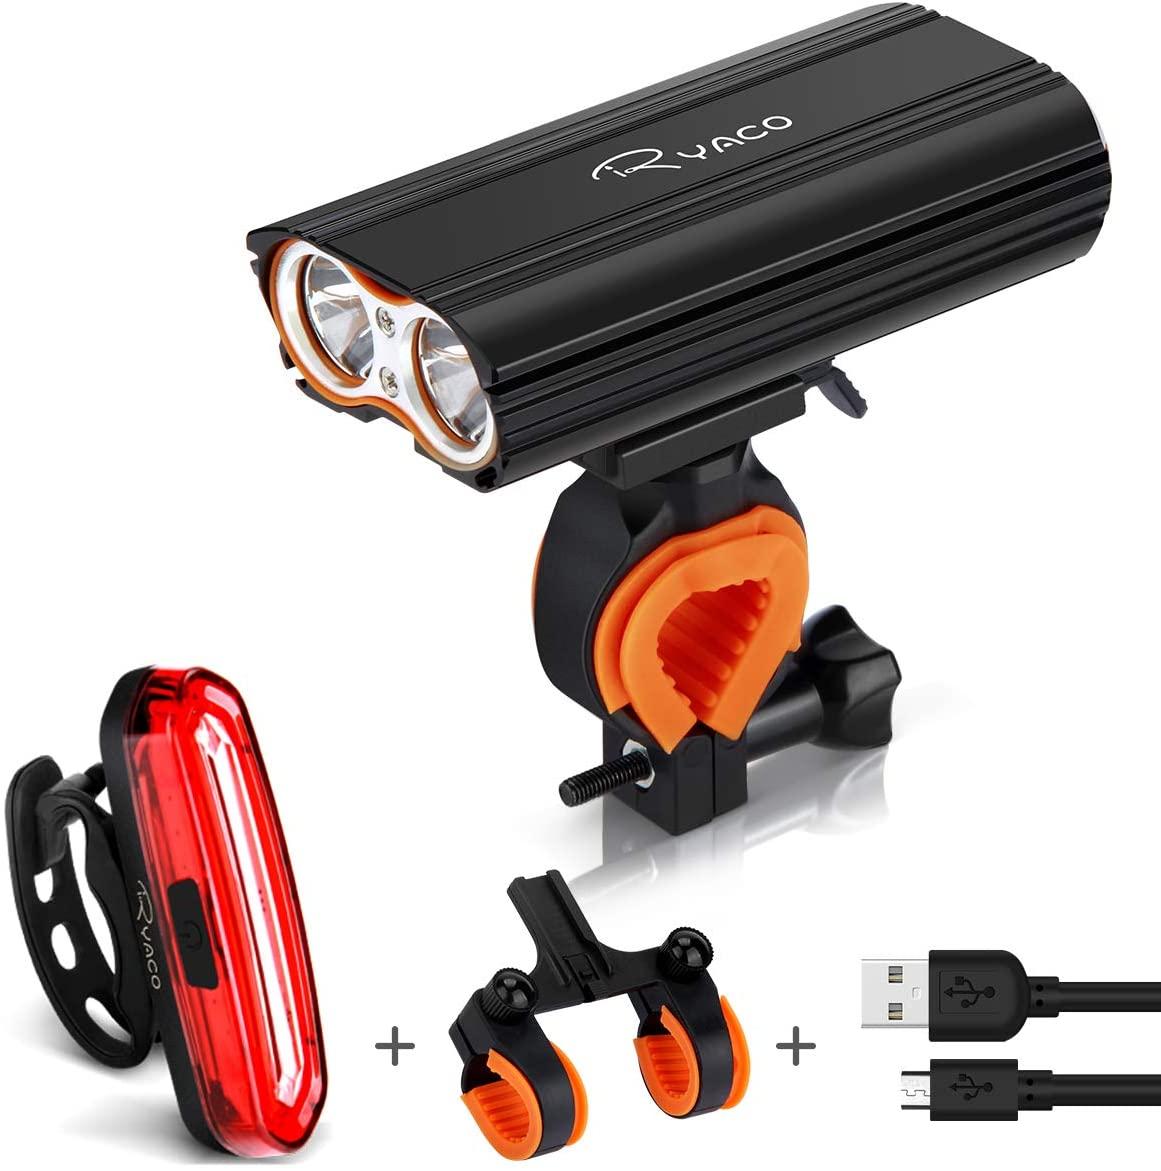 Ryaco Luz Bicicleta Recargable USB